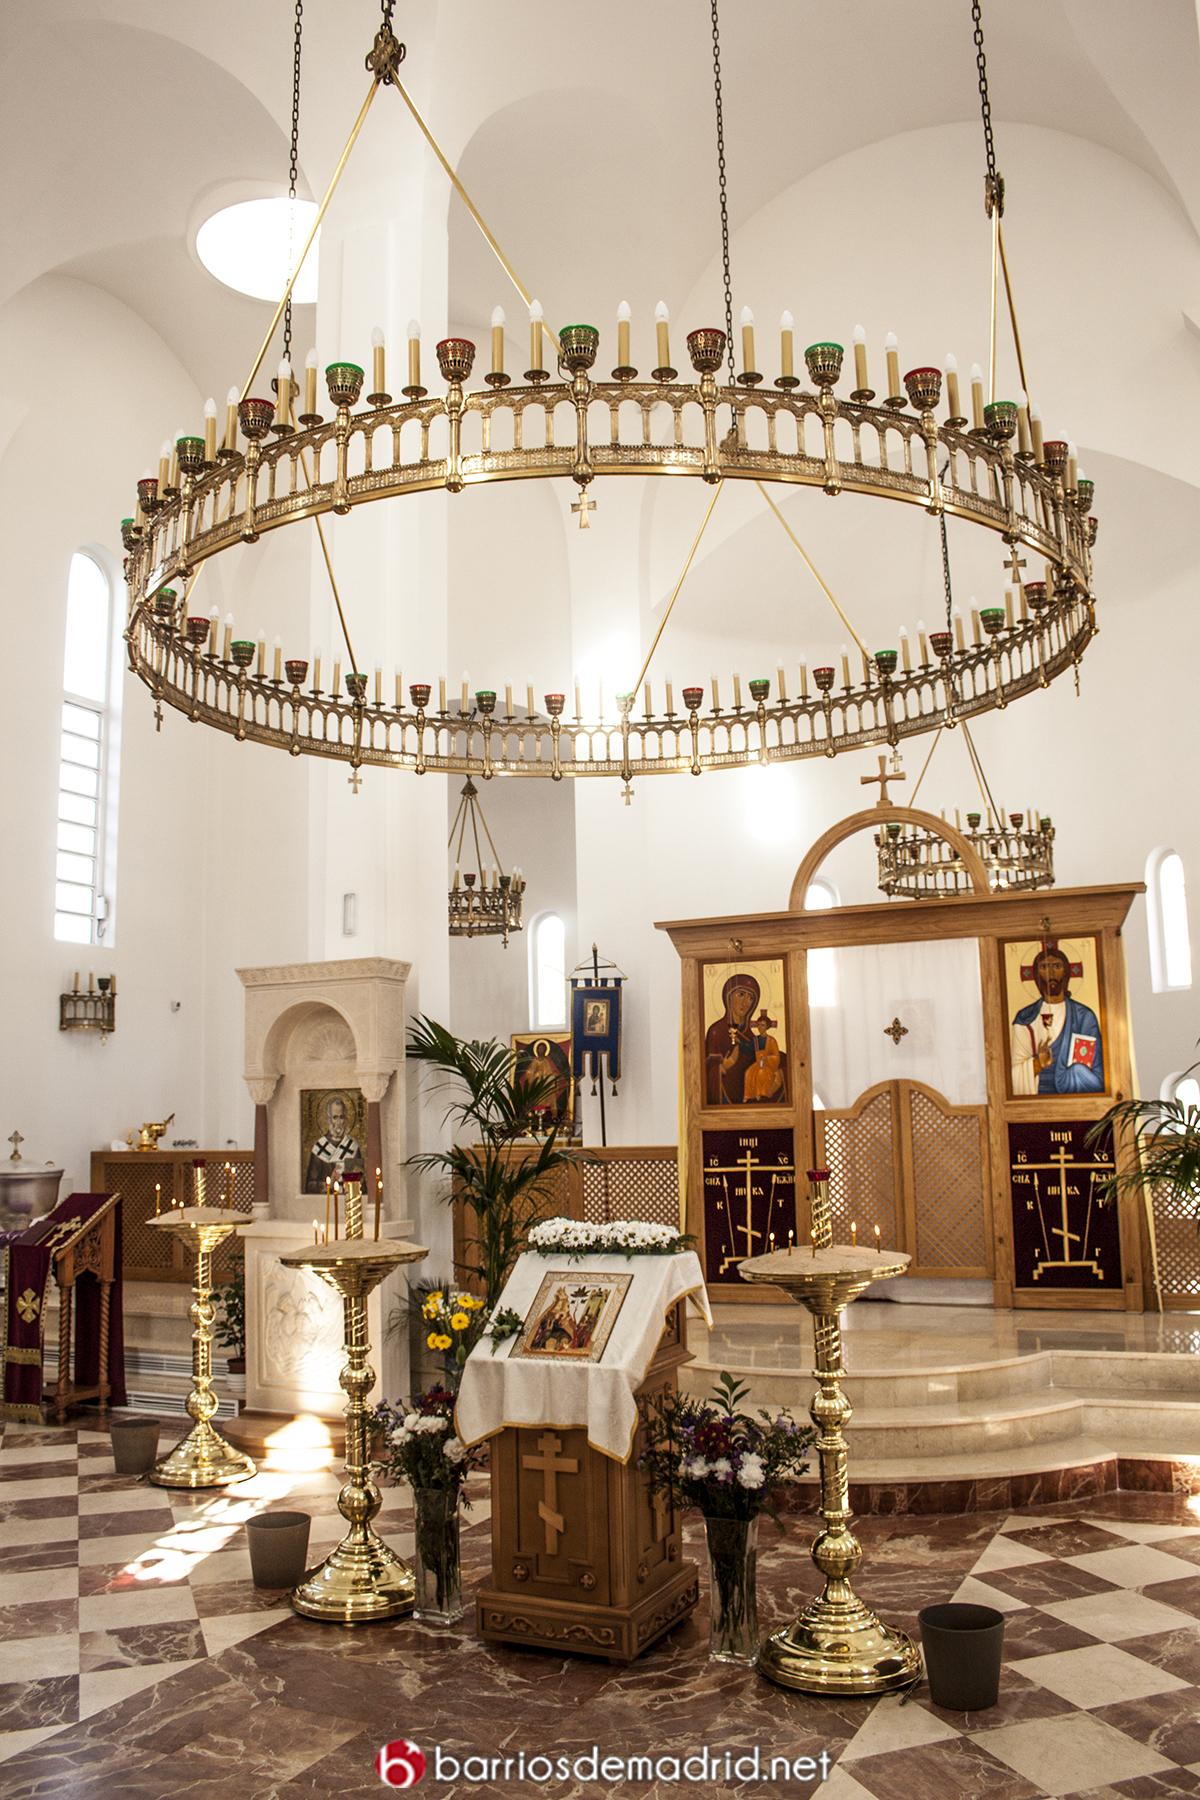 iglesia ortodoxa interior